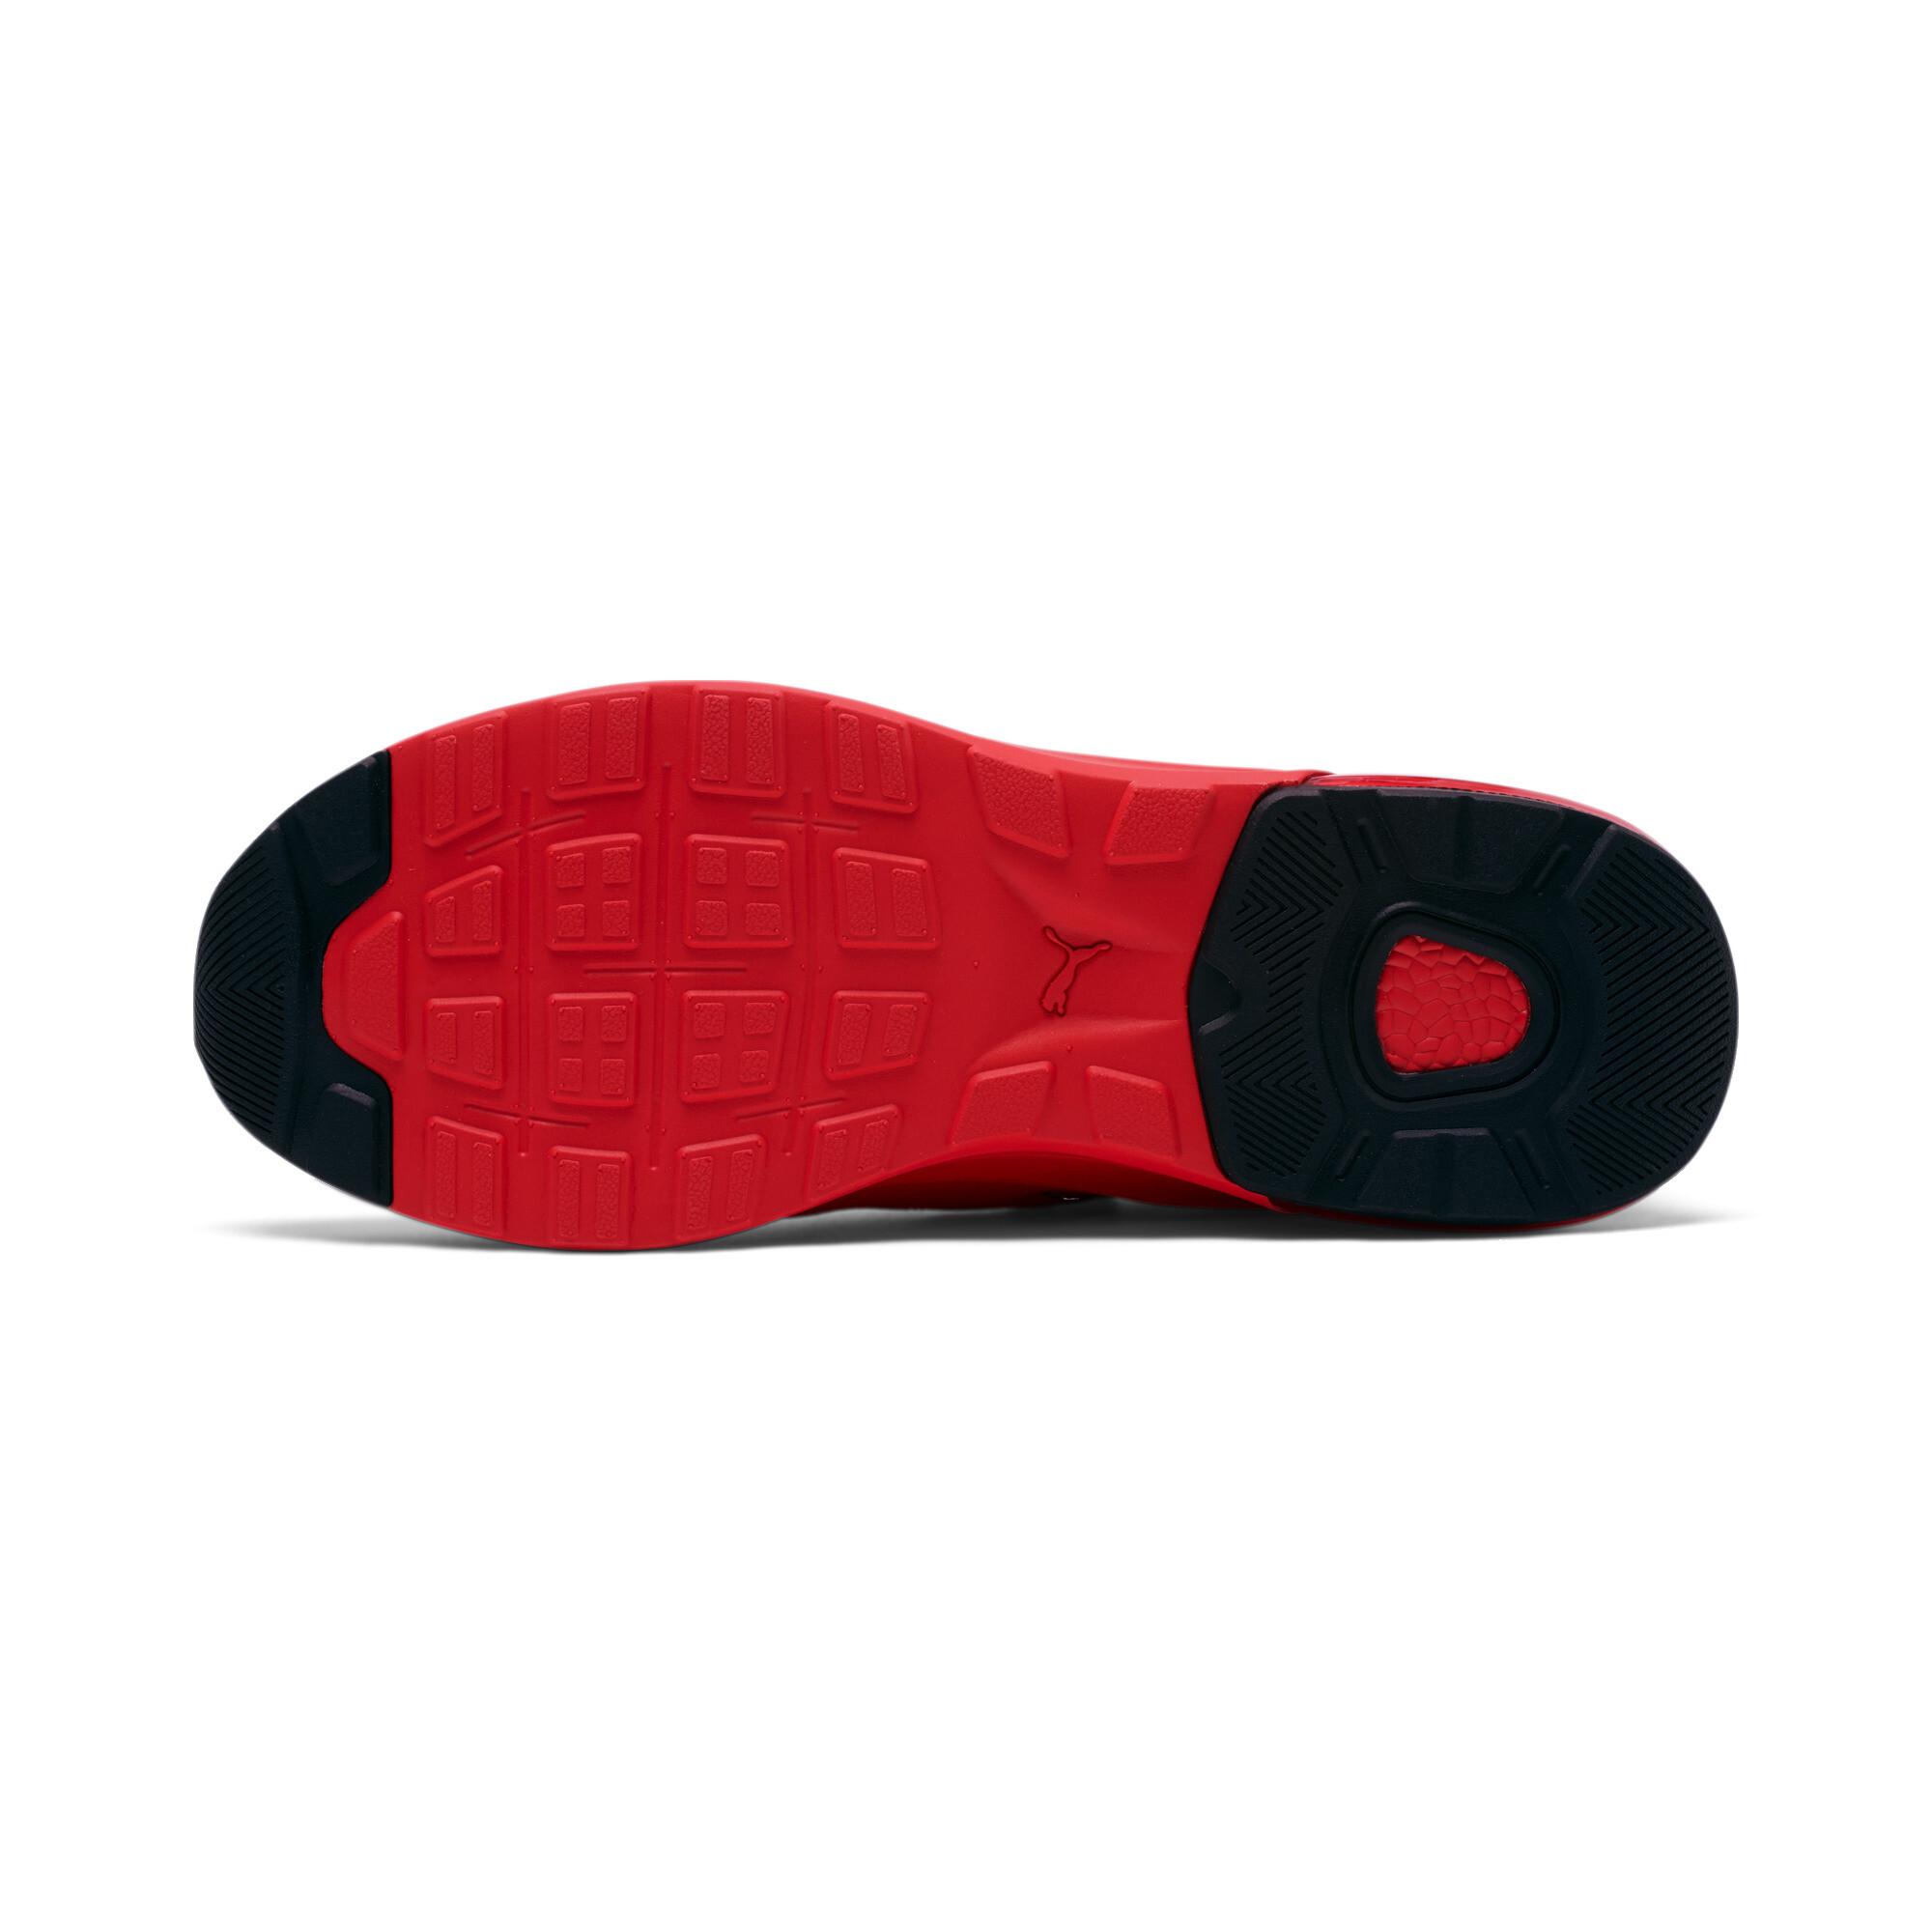 PUMA-Men-039-s-Electron-Street-Sneakers thumbnail 32